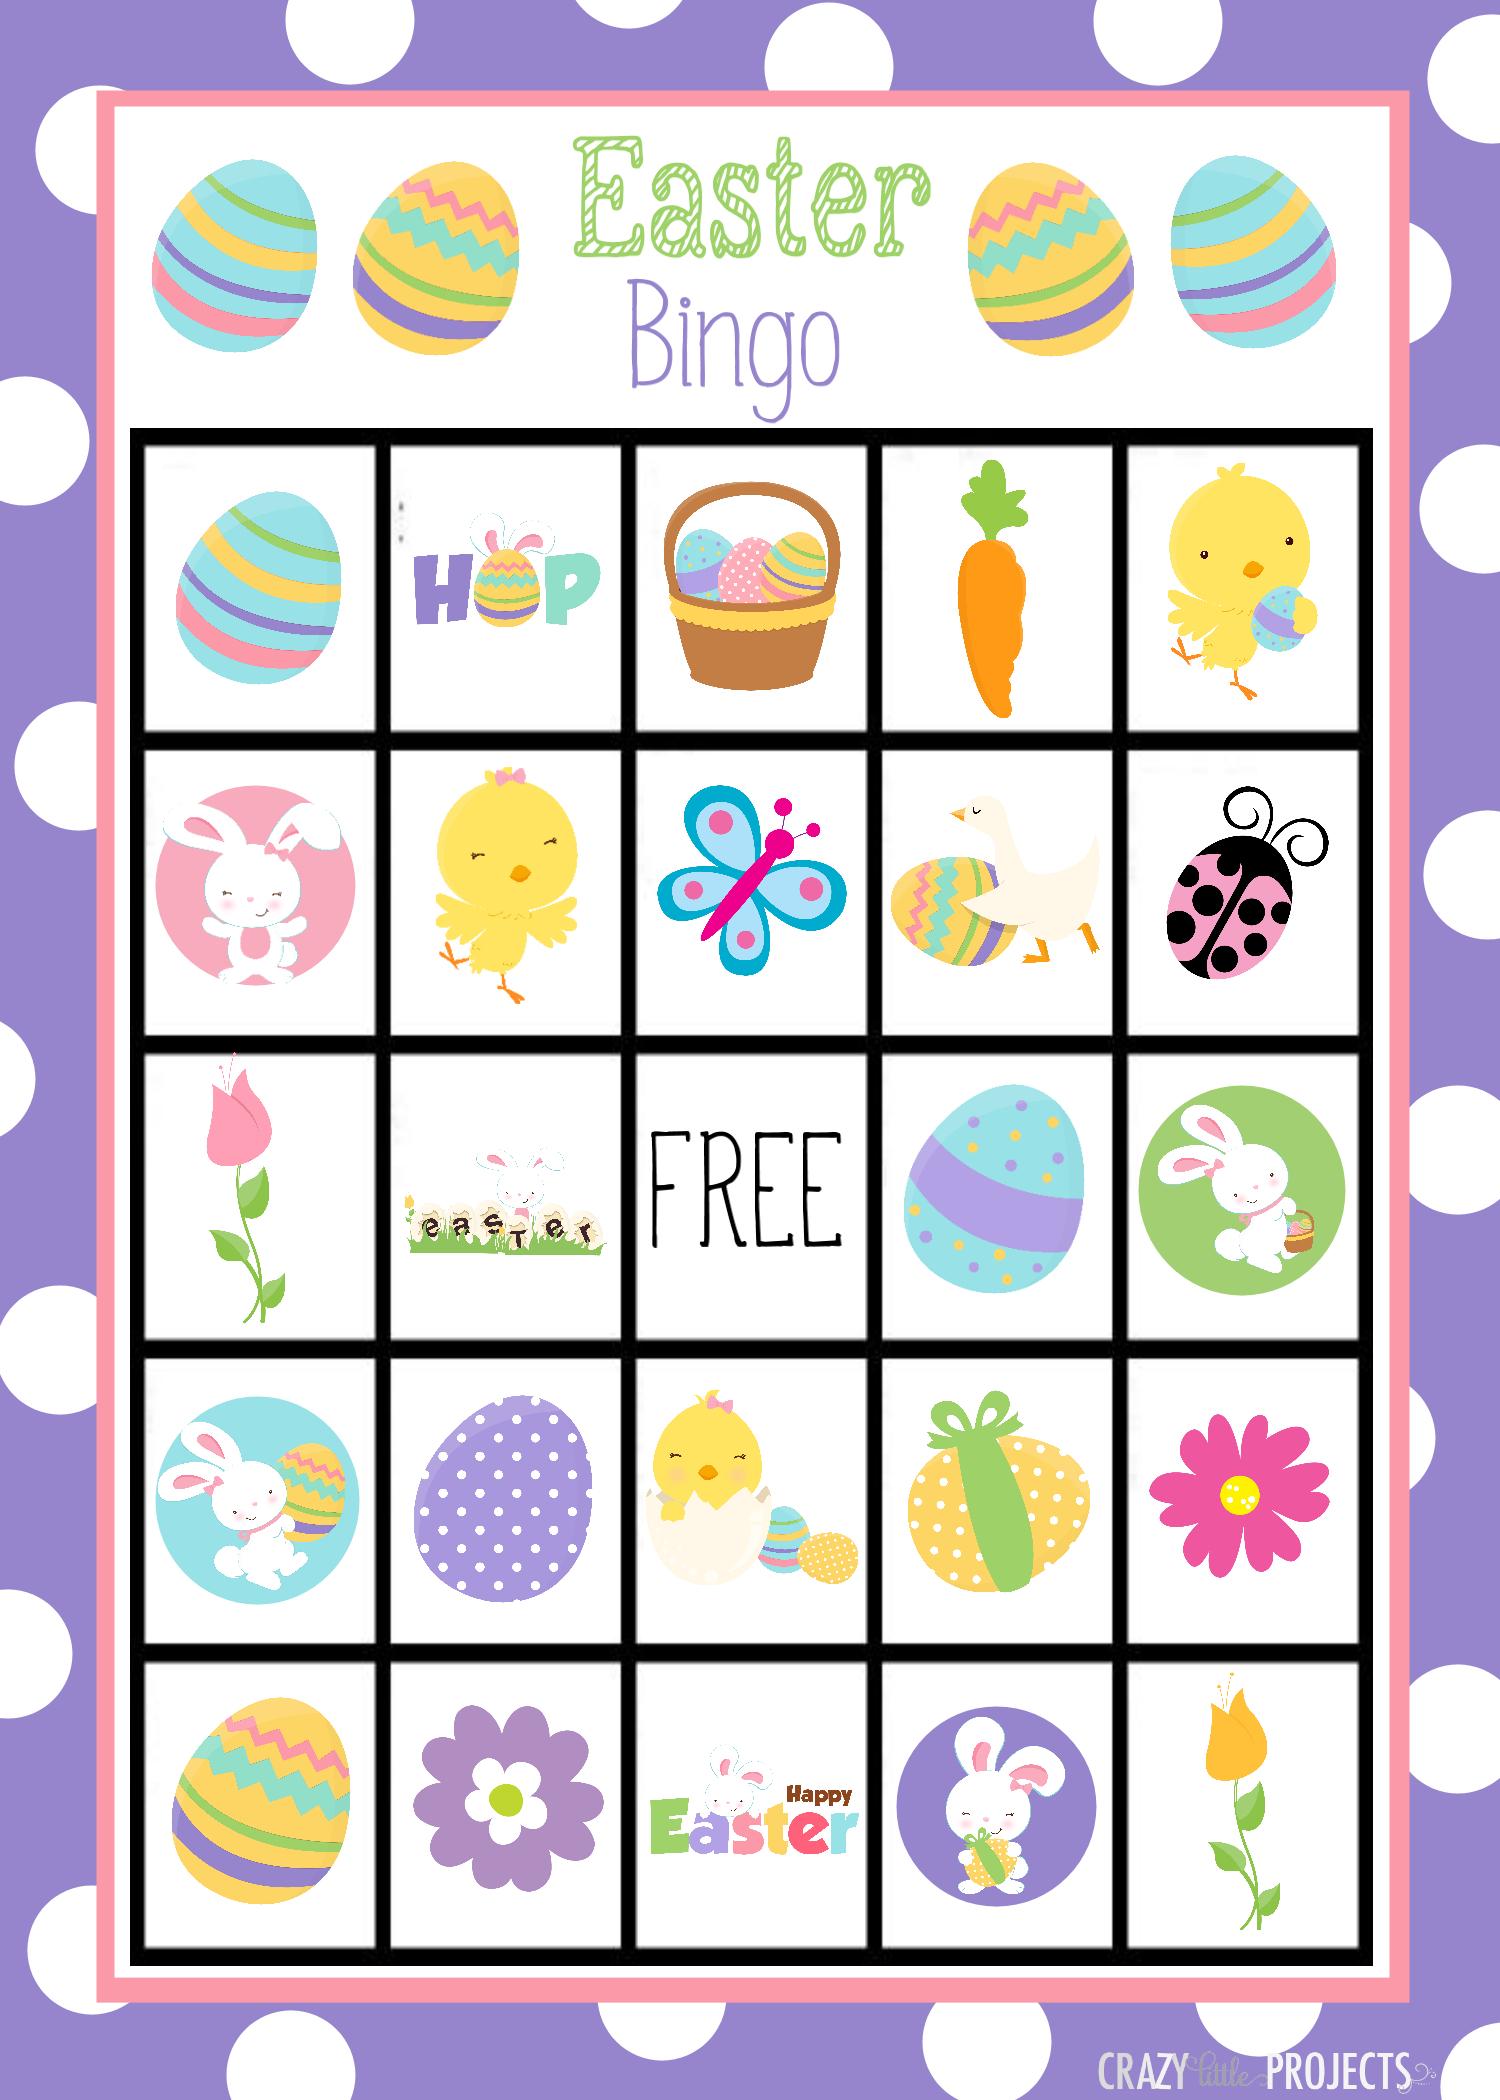 Easter Bingo Free Printable – Hd Easter Images - Free Printable Religious Easter Bingo Cards